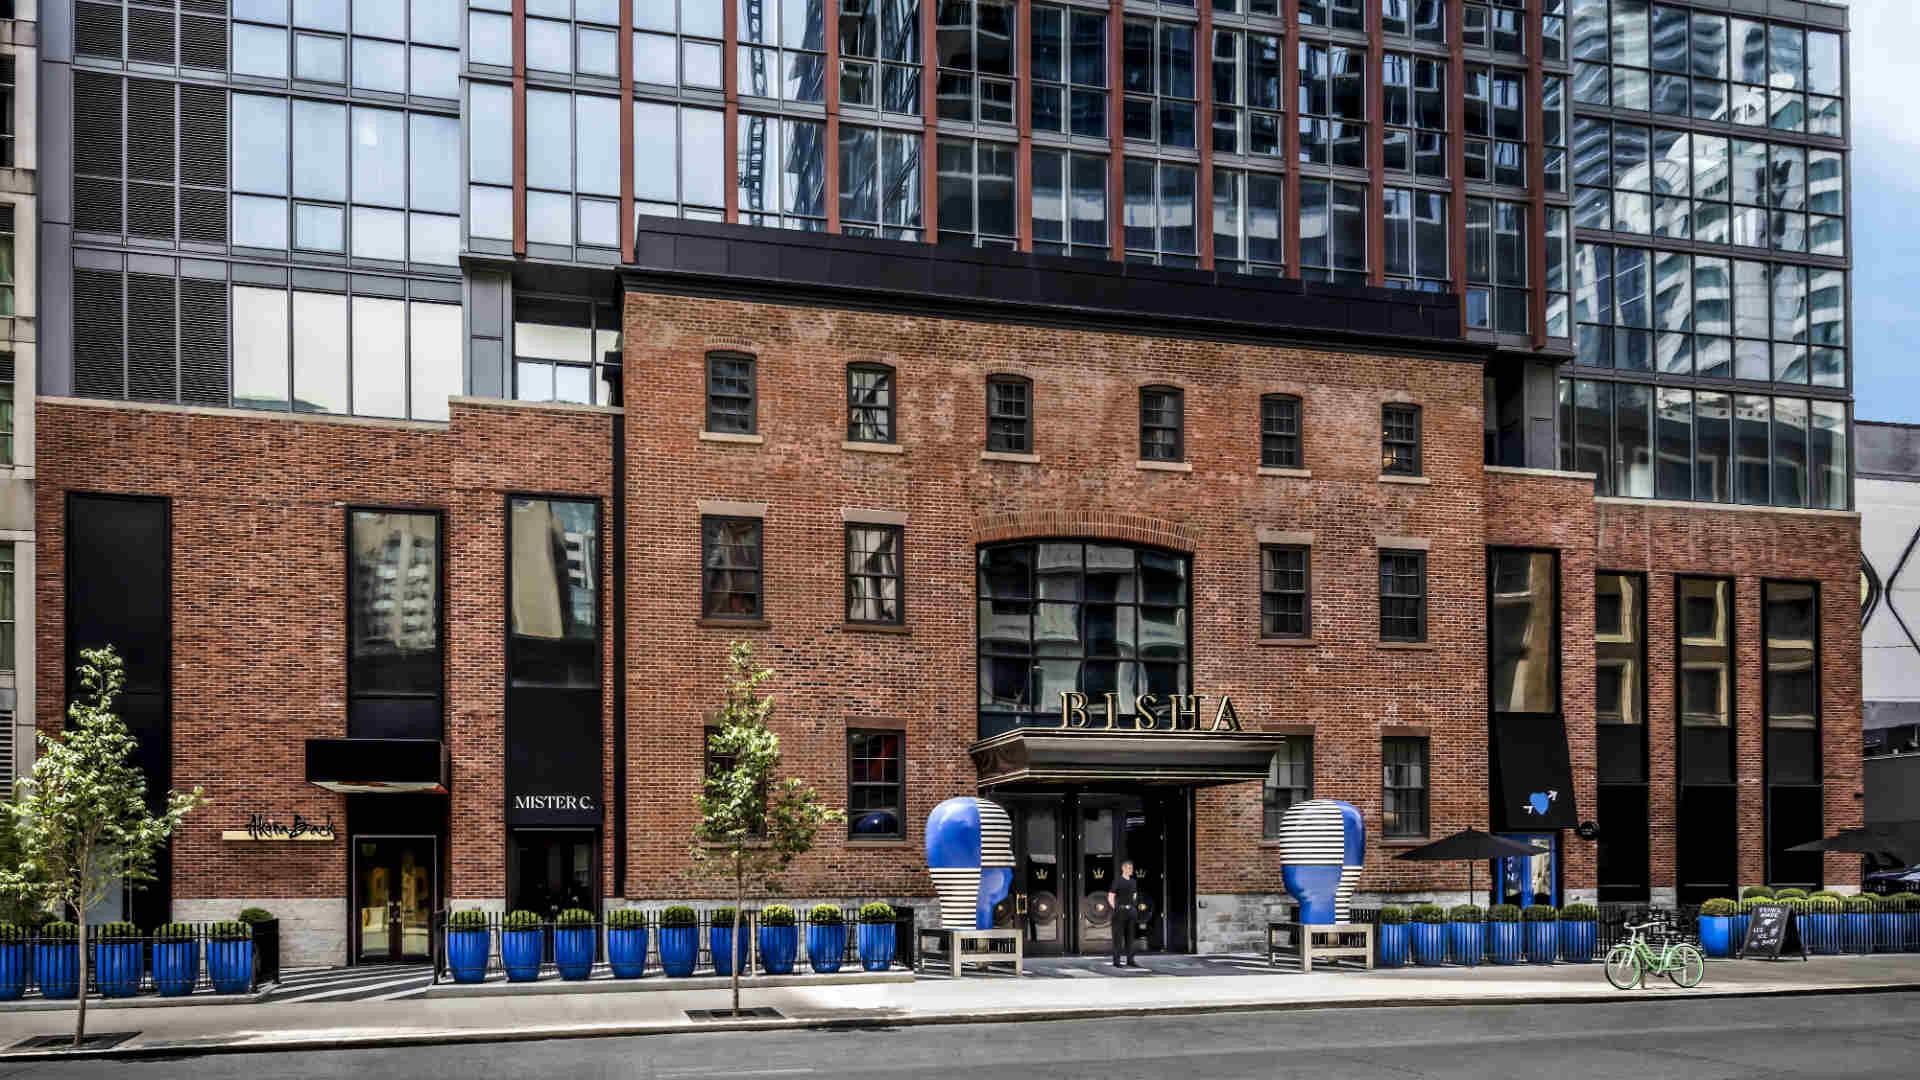 Best hotels Toronto staycation | The Bisha Hotel street view